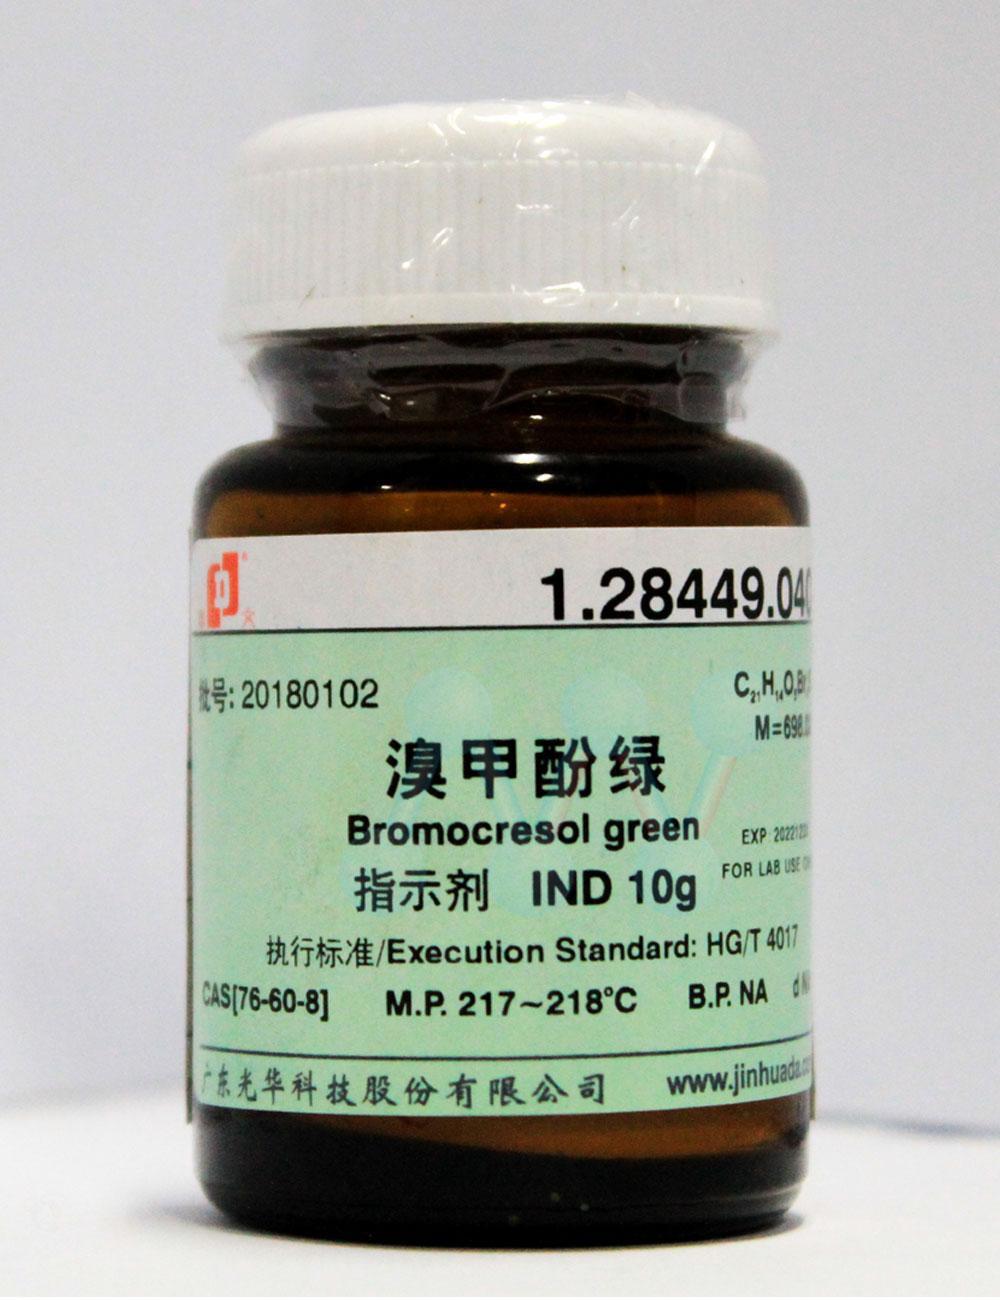 Bromo Cresol green C21H14Br4O5S Trung Quốc